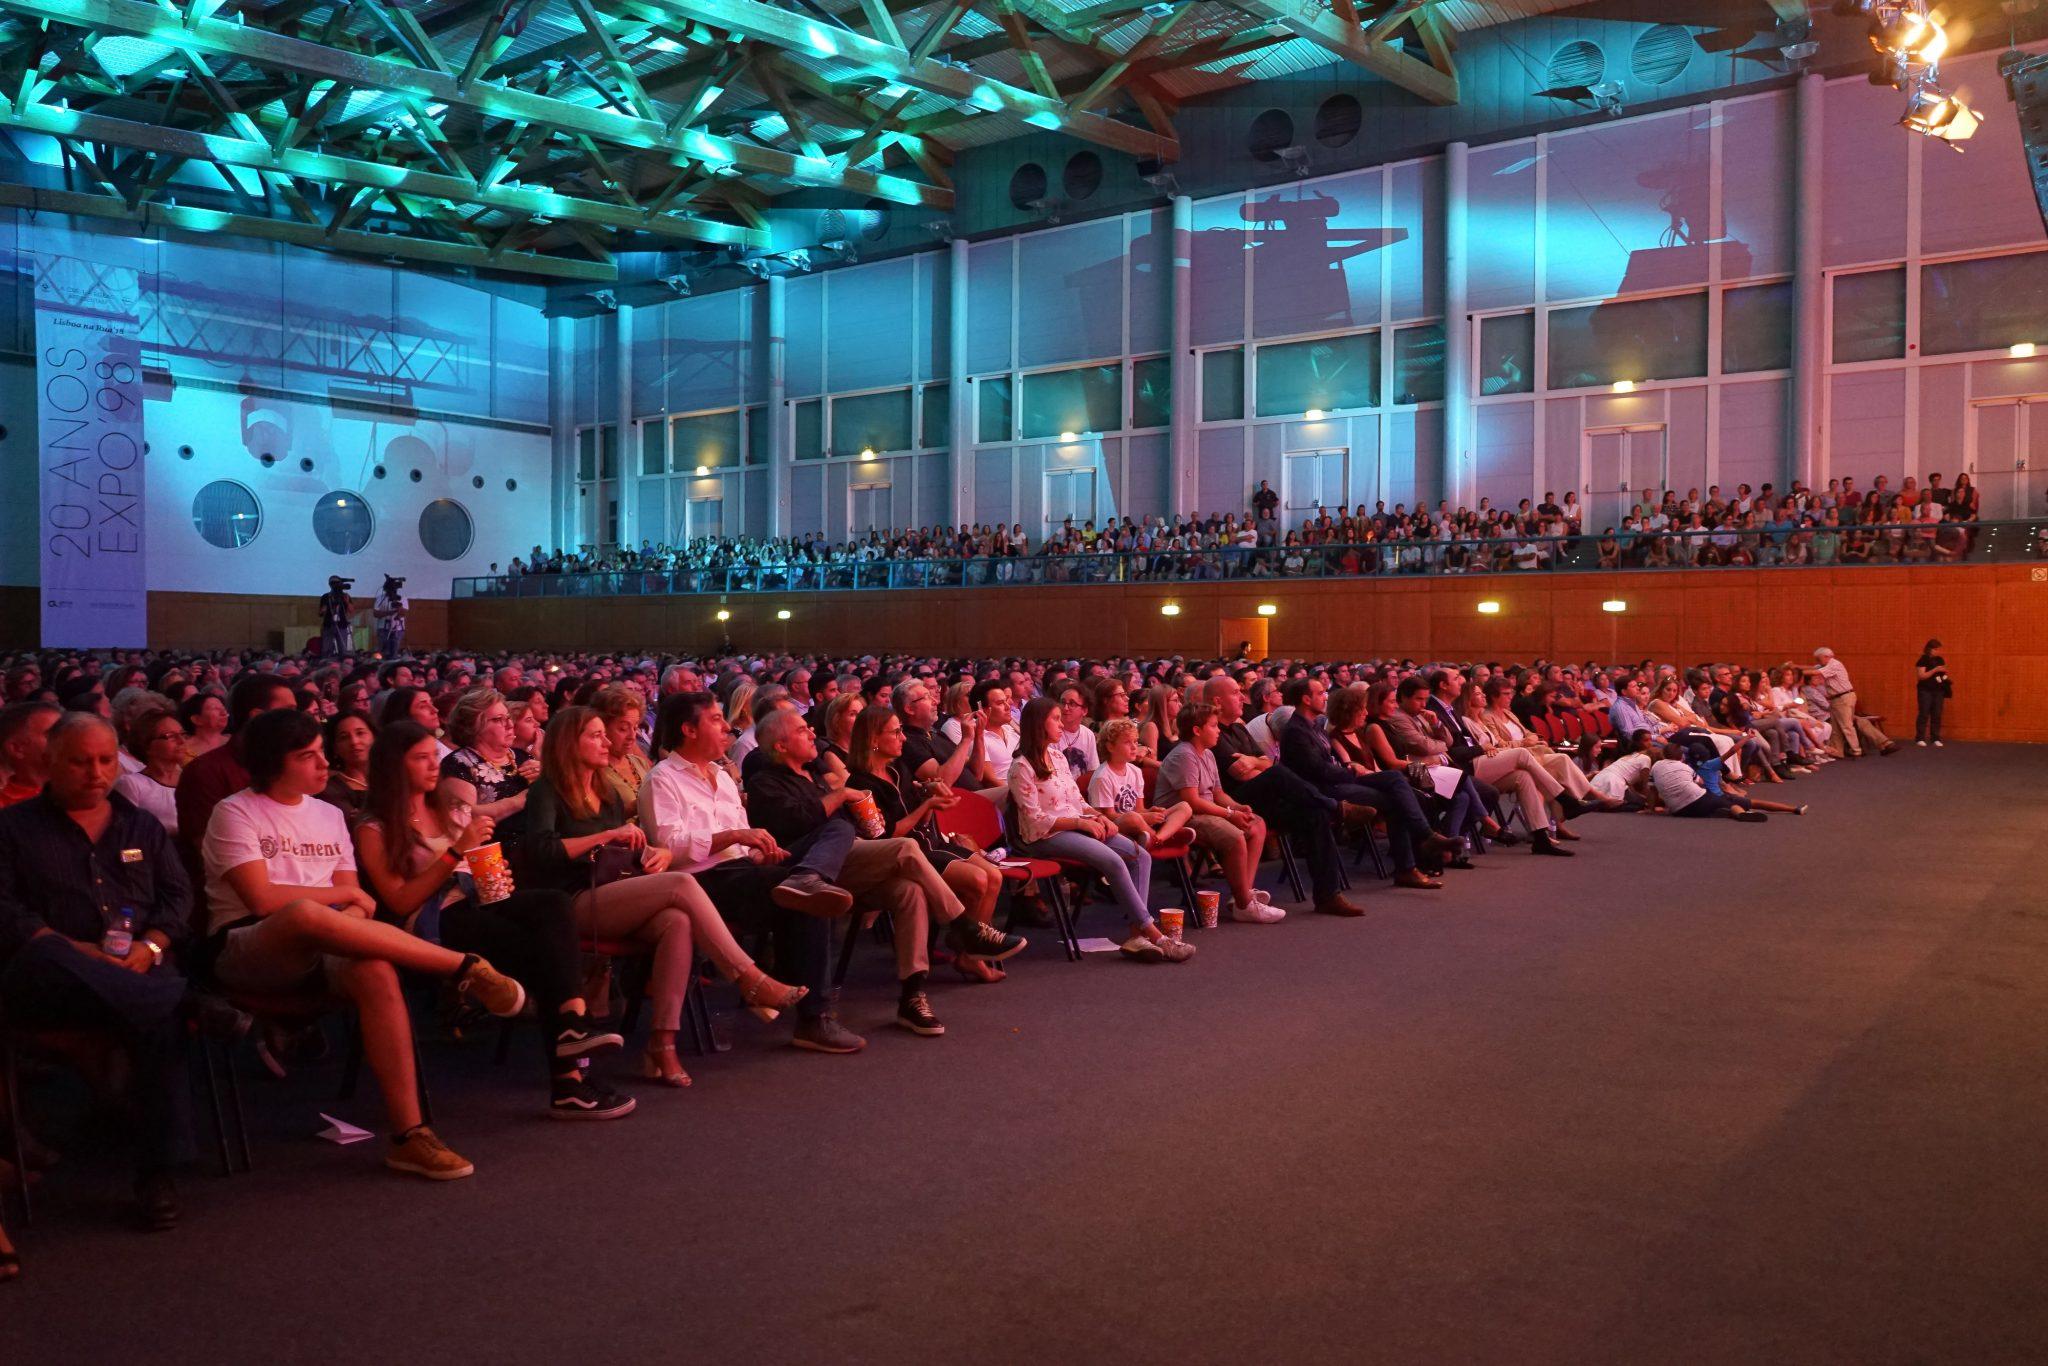 Público sentado durante o concerto